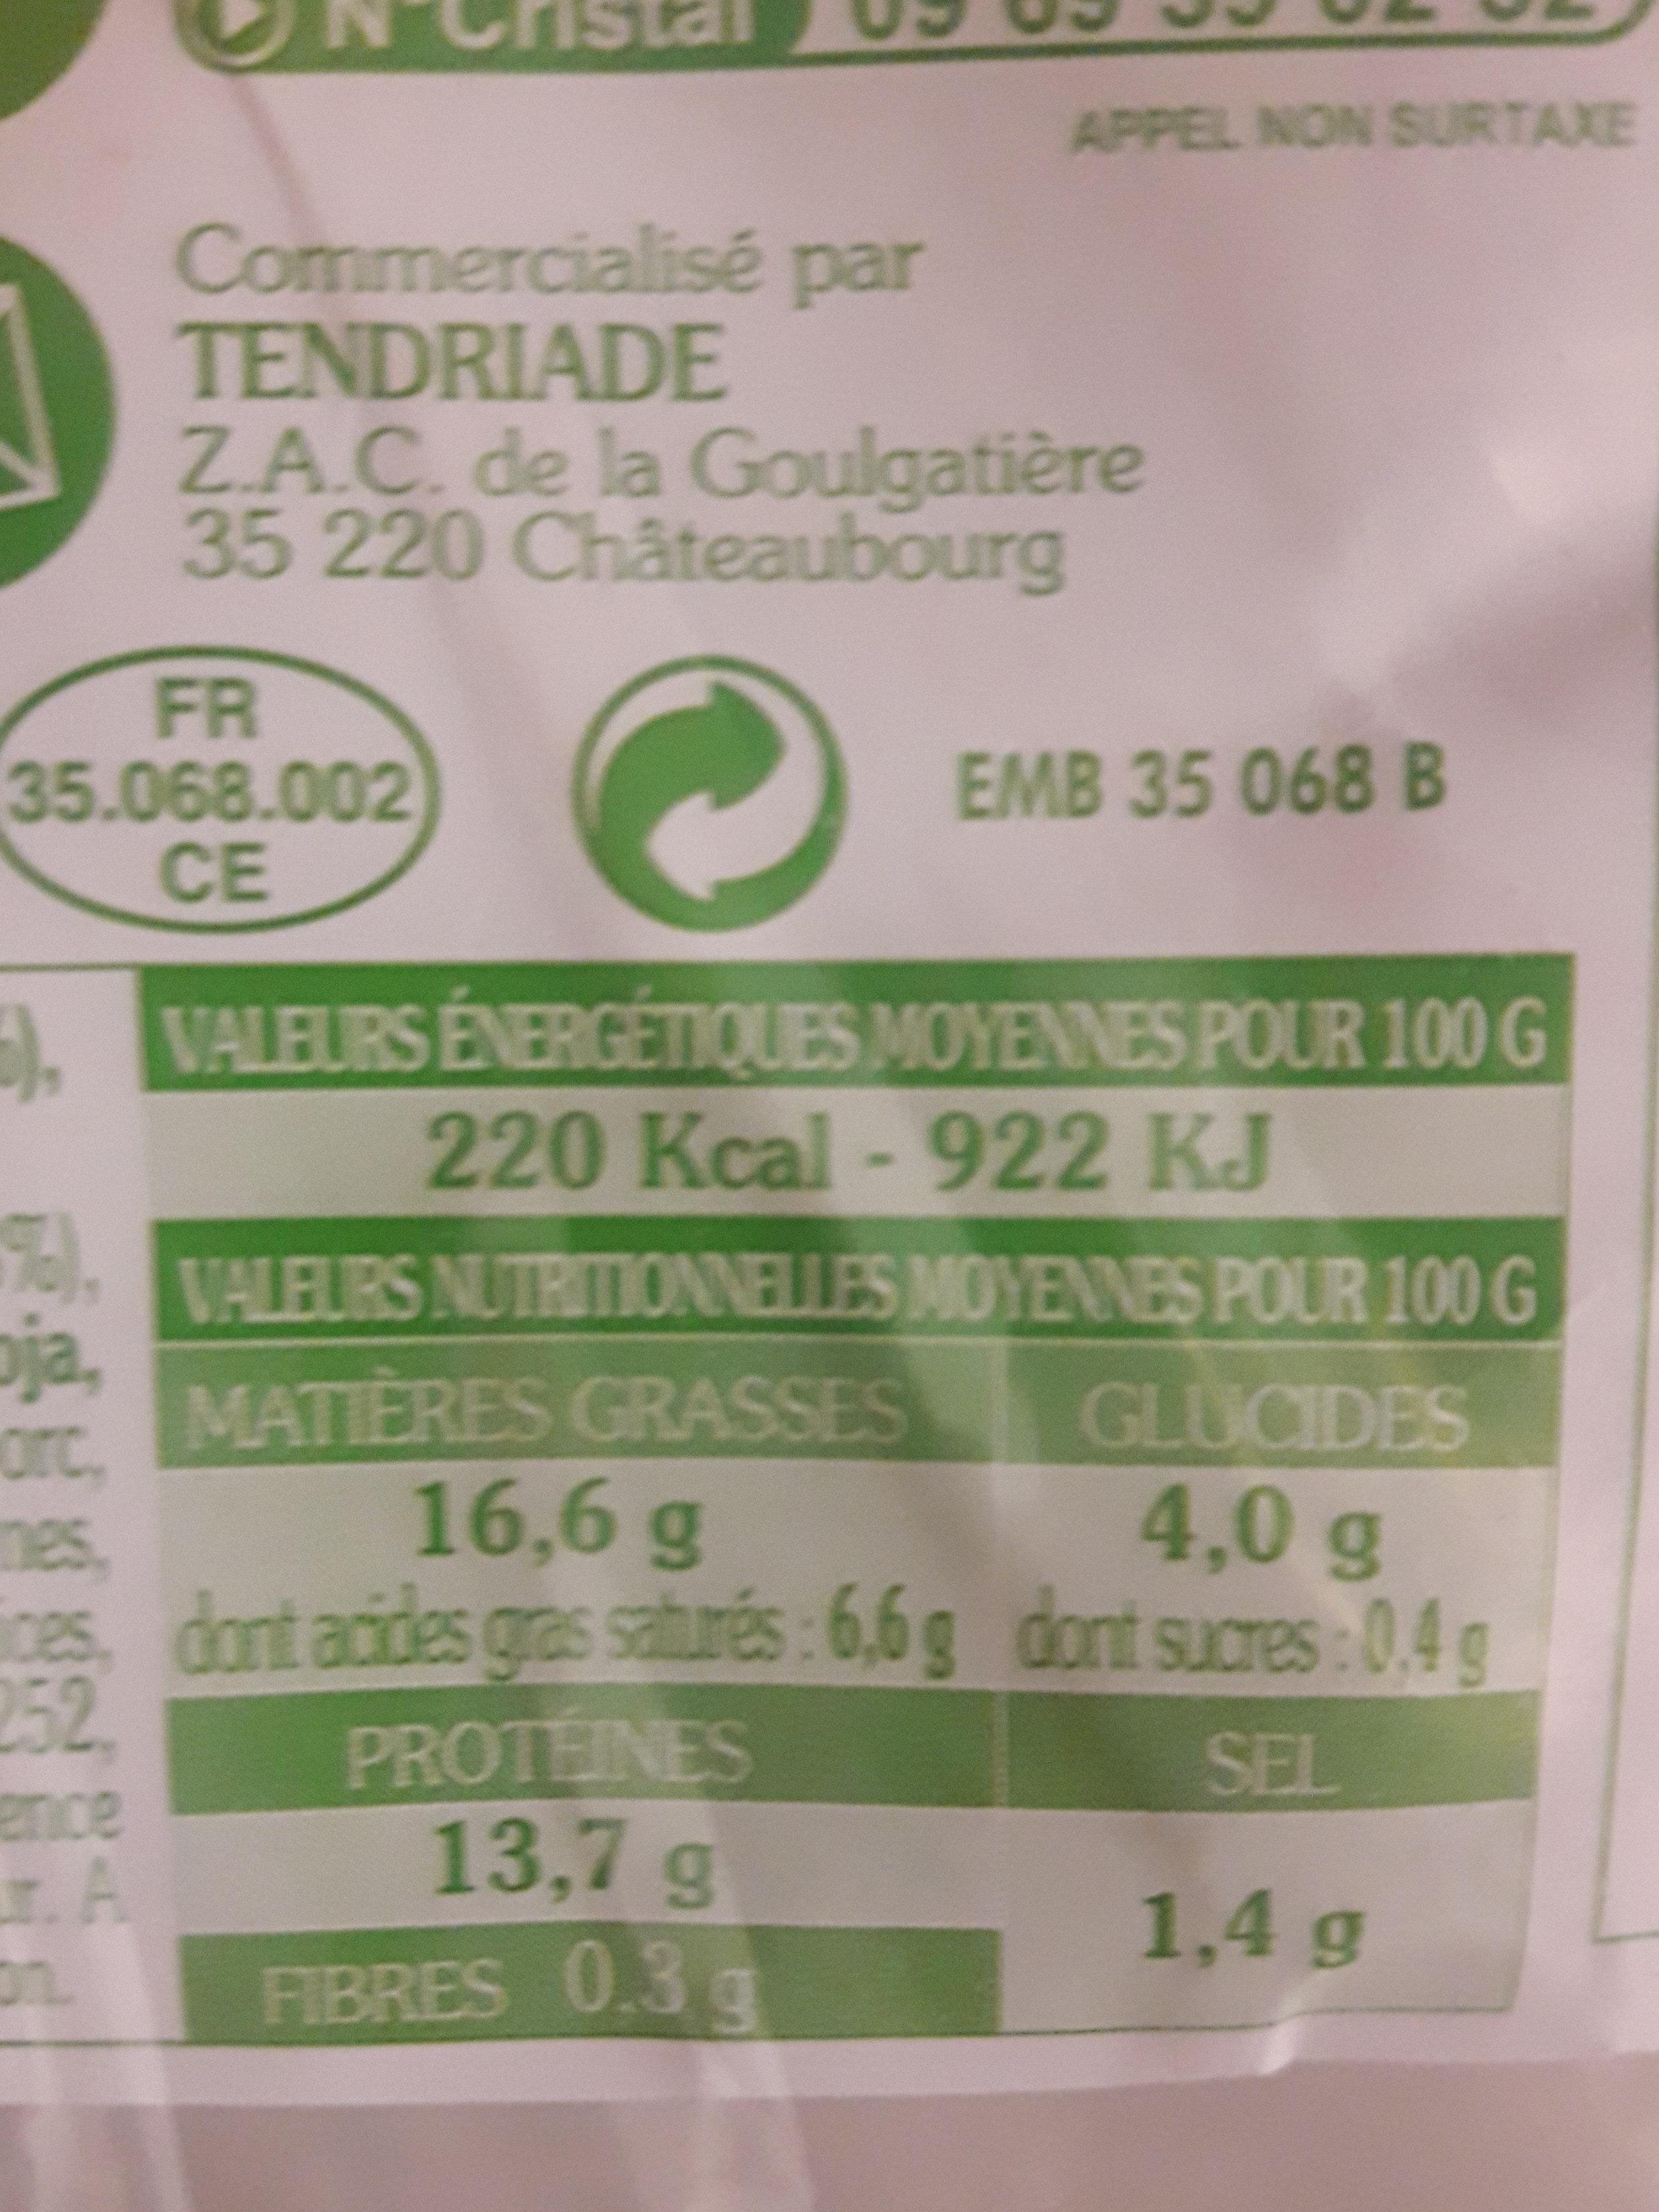 Paupiettes de veau - Voedingswaarden - fr